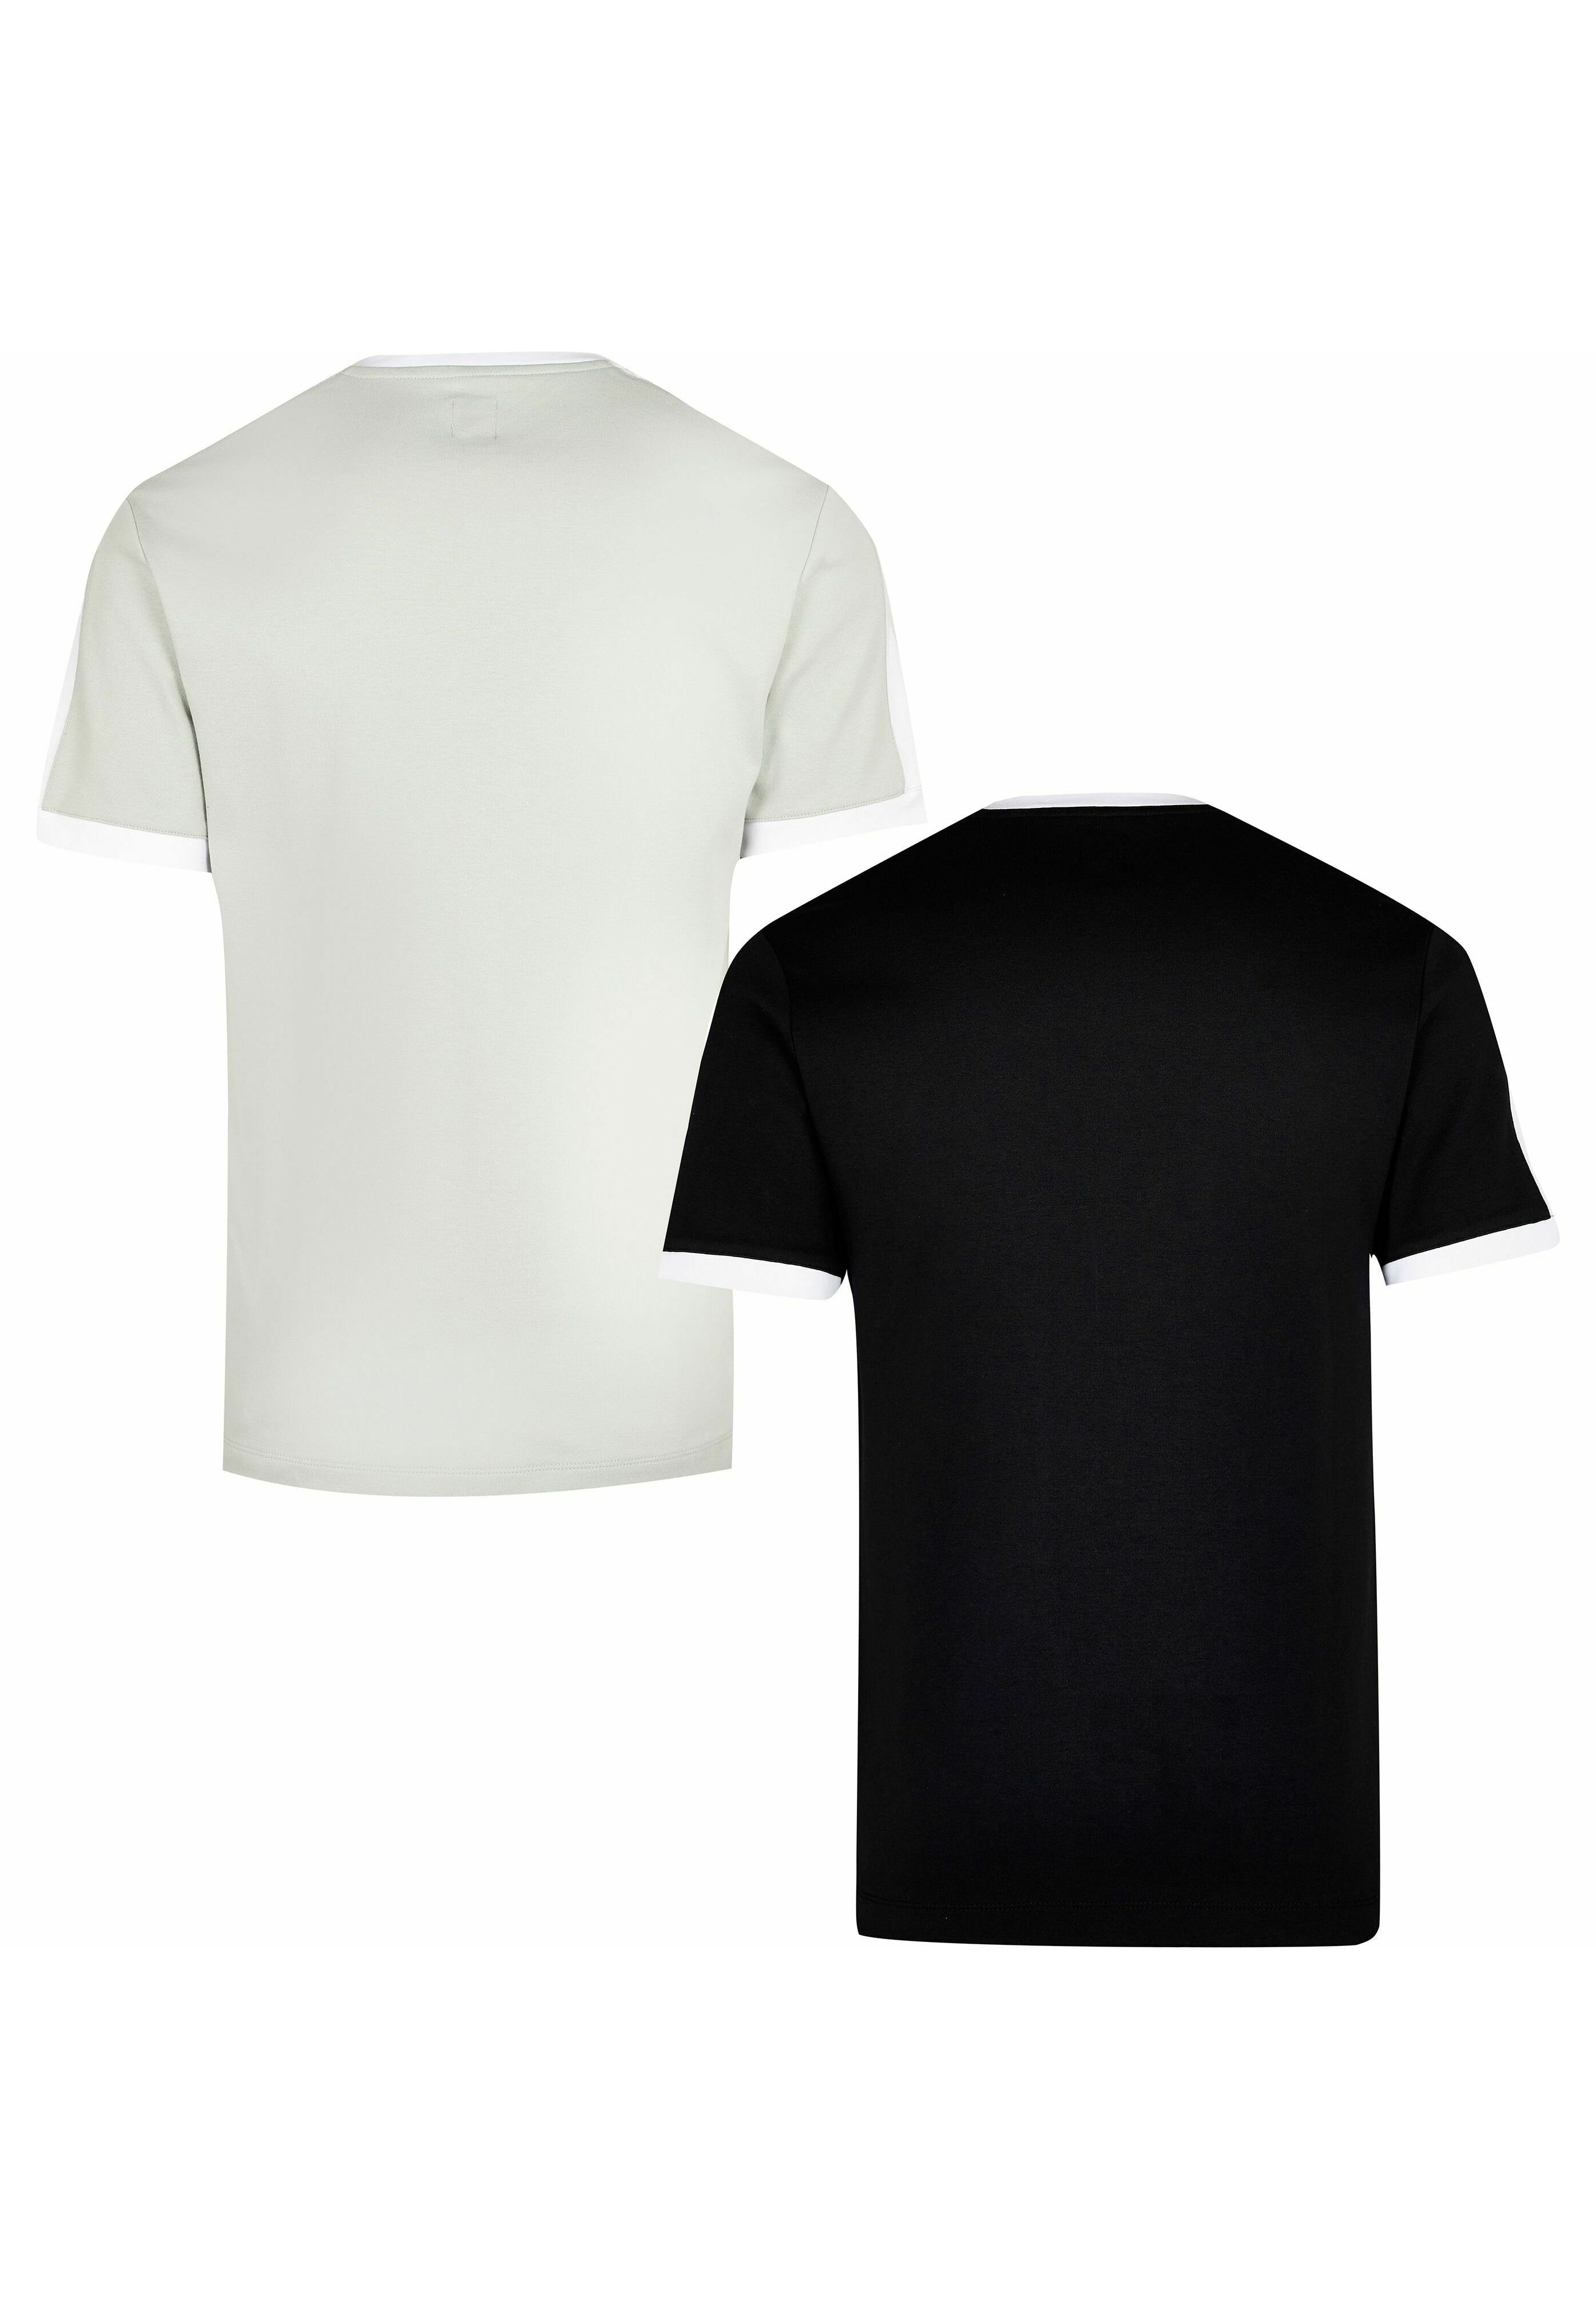 Homme Pack of 2 - T-shirt basique